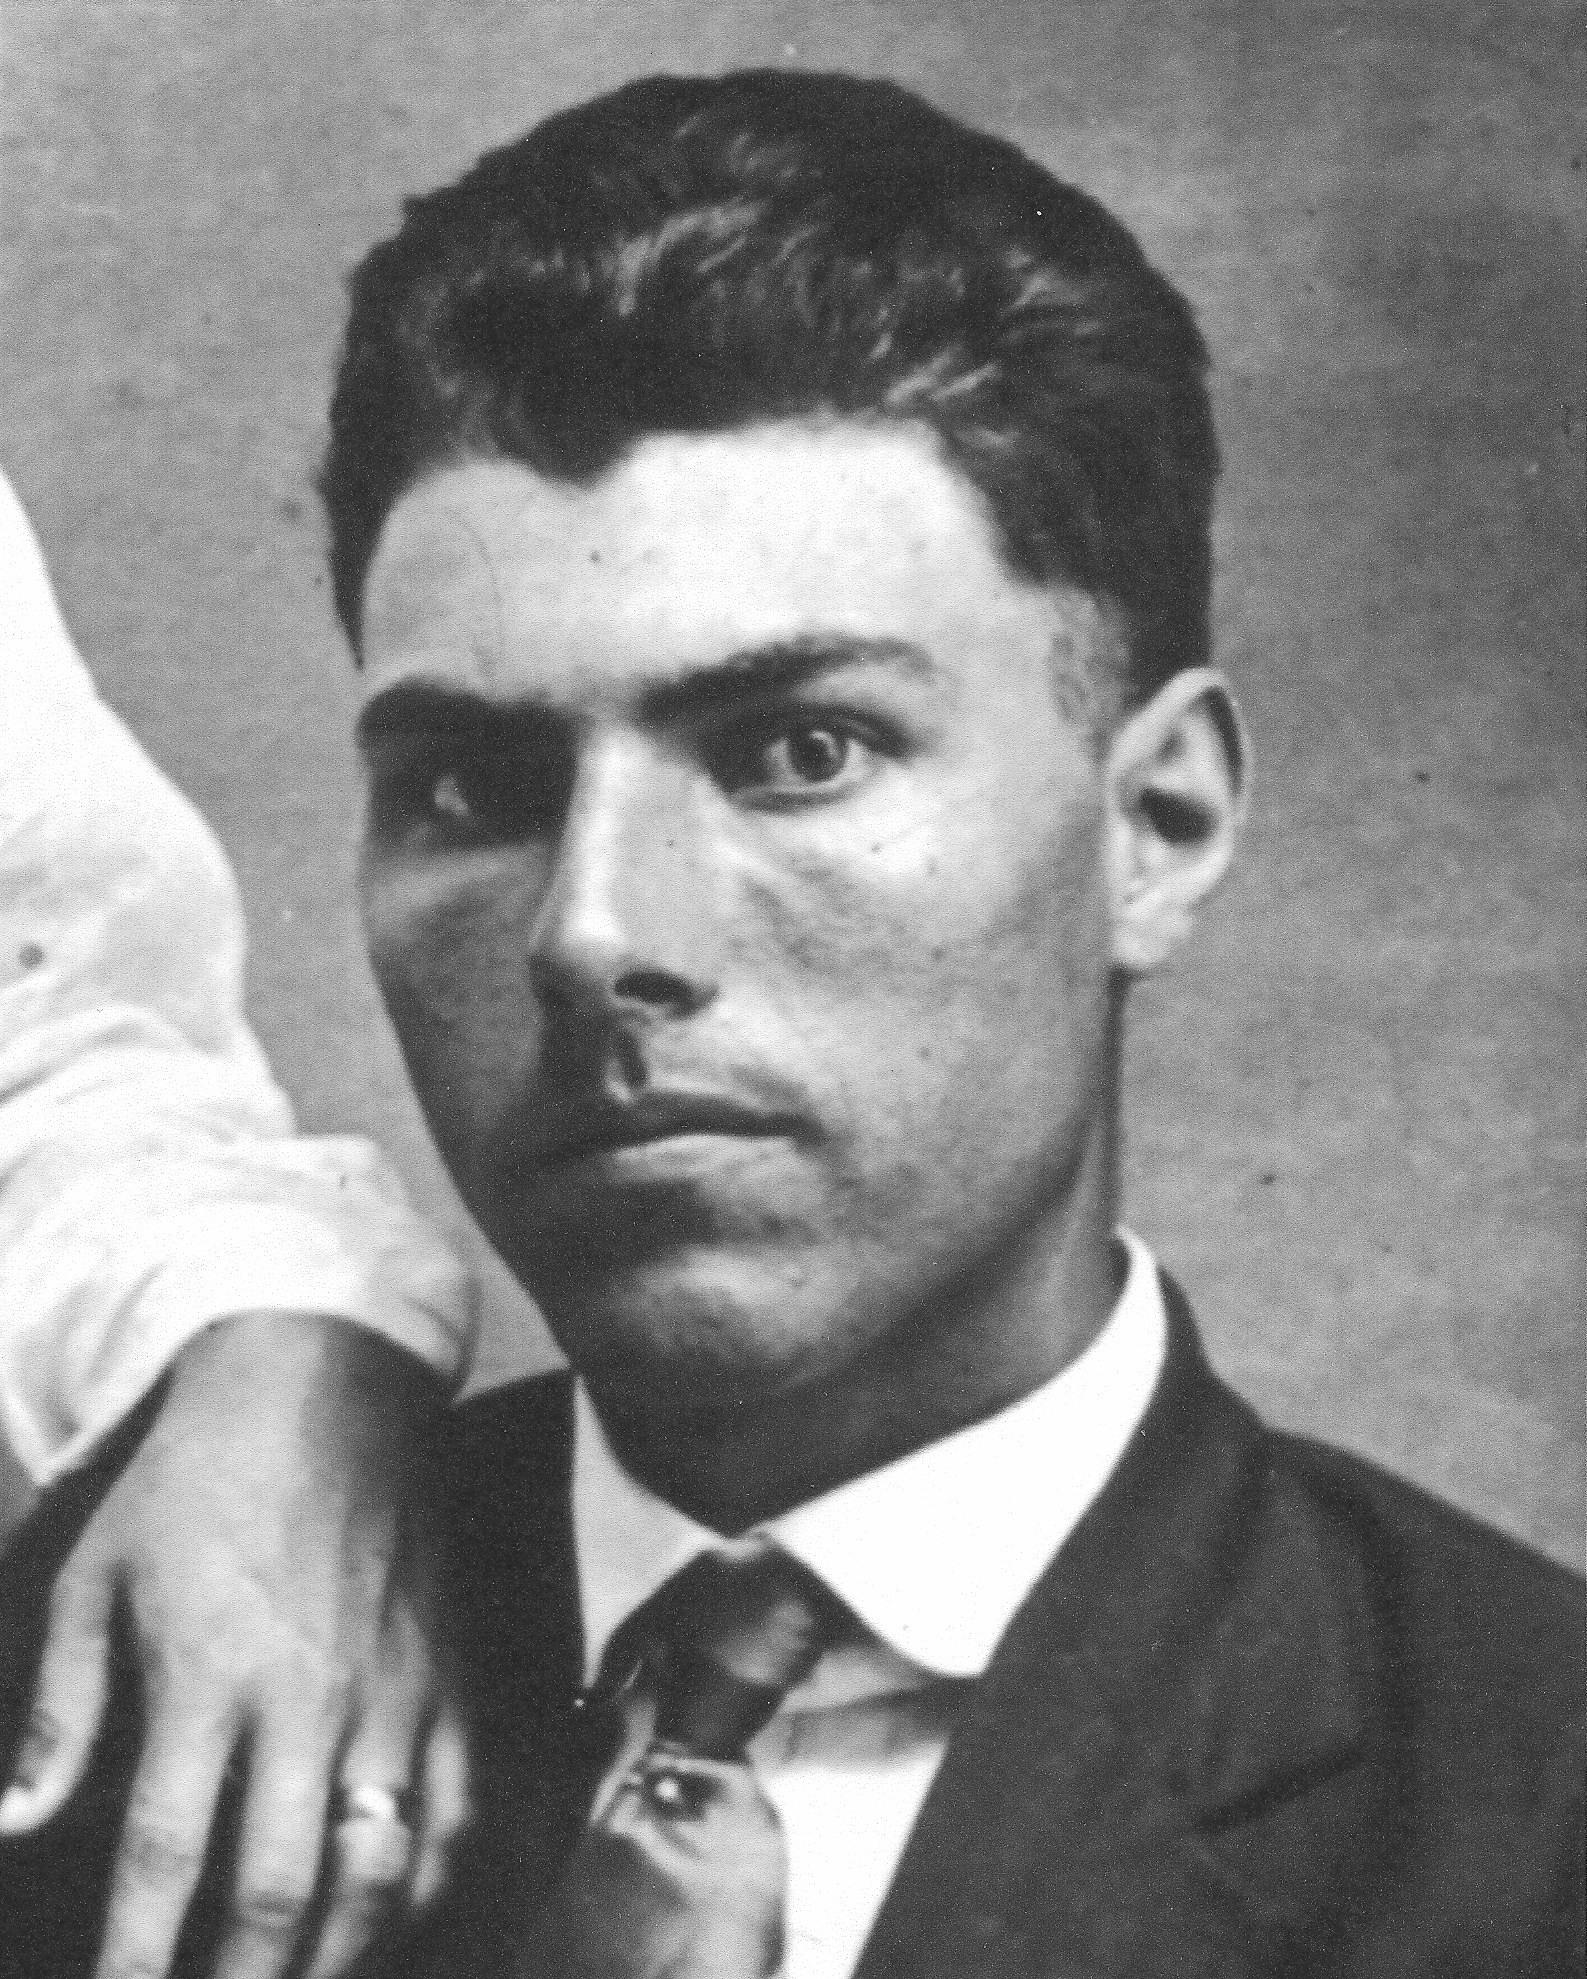 George Henry Riggs